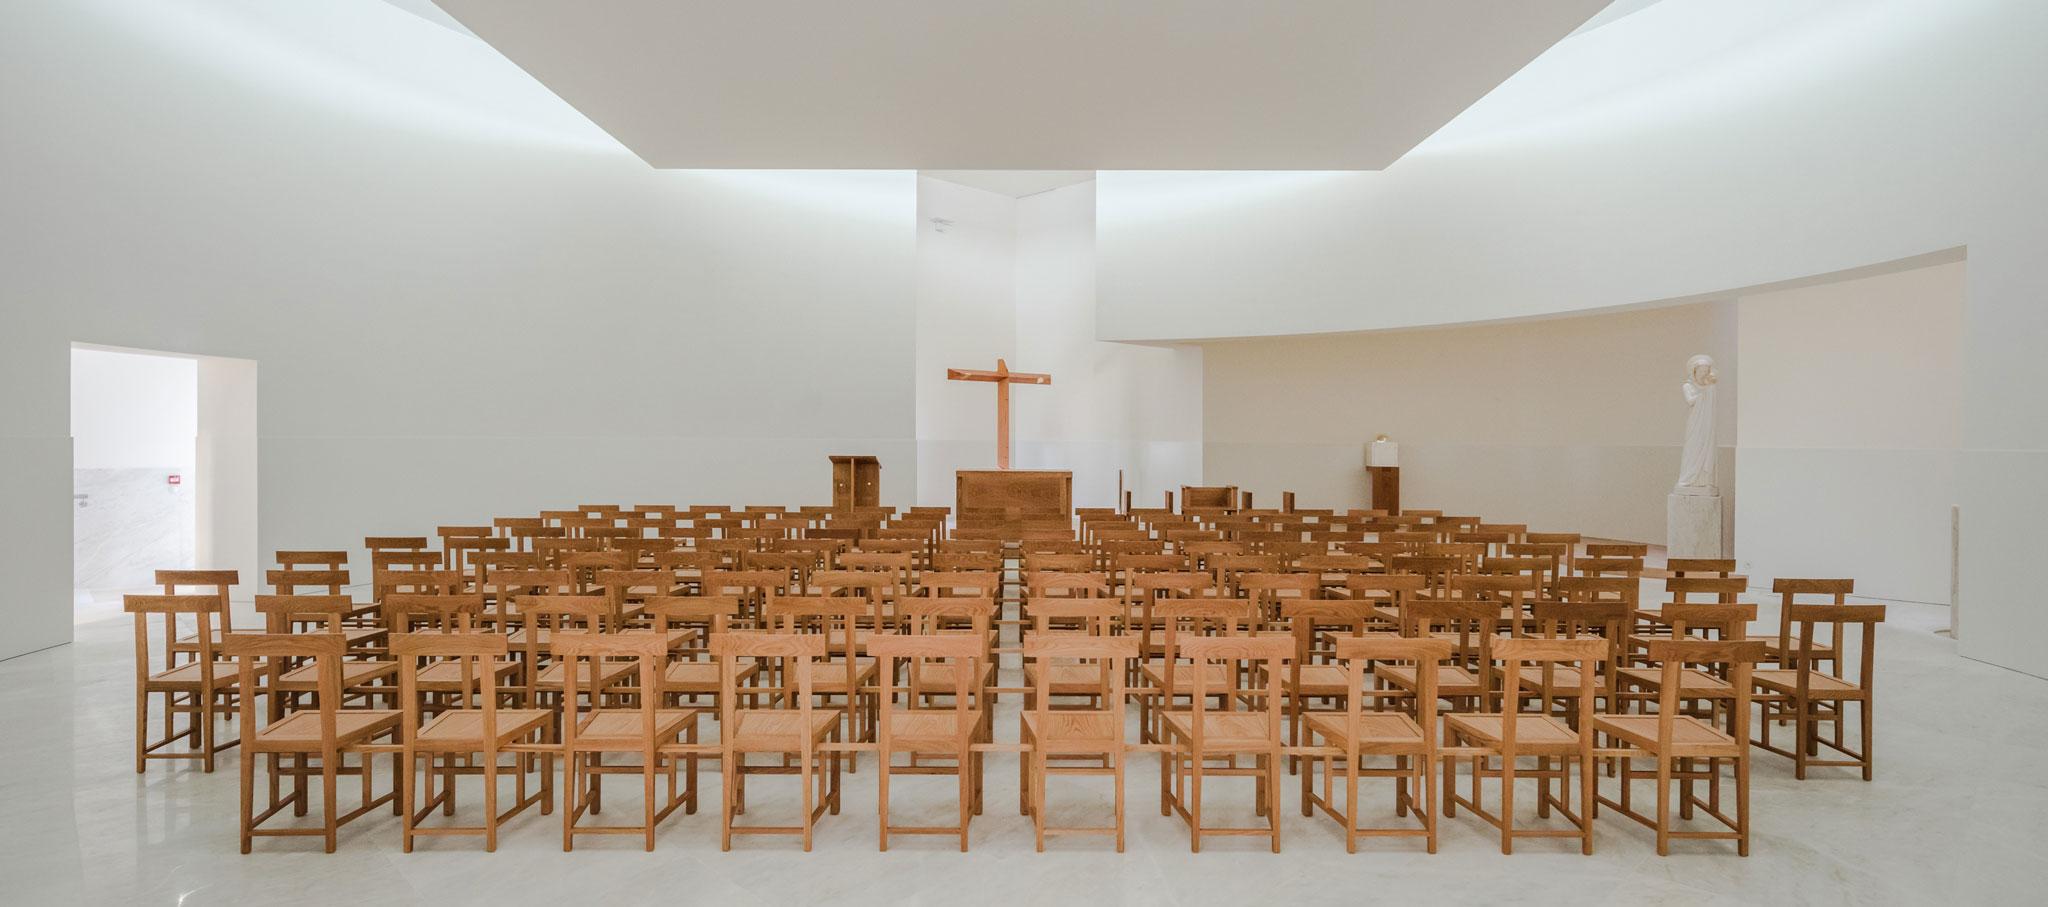 Interior view. Álvaro Siza designs the Saint-Jacques-de-la-Lande church. Photograph © Joao Morgado